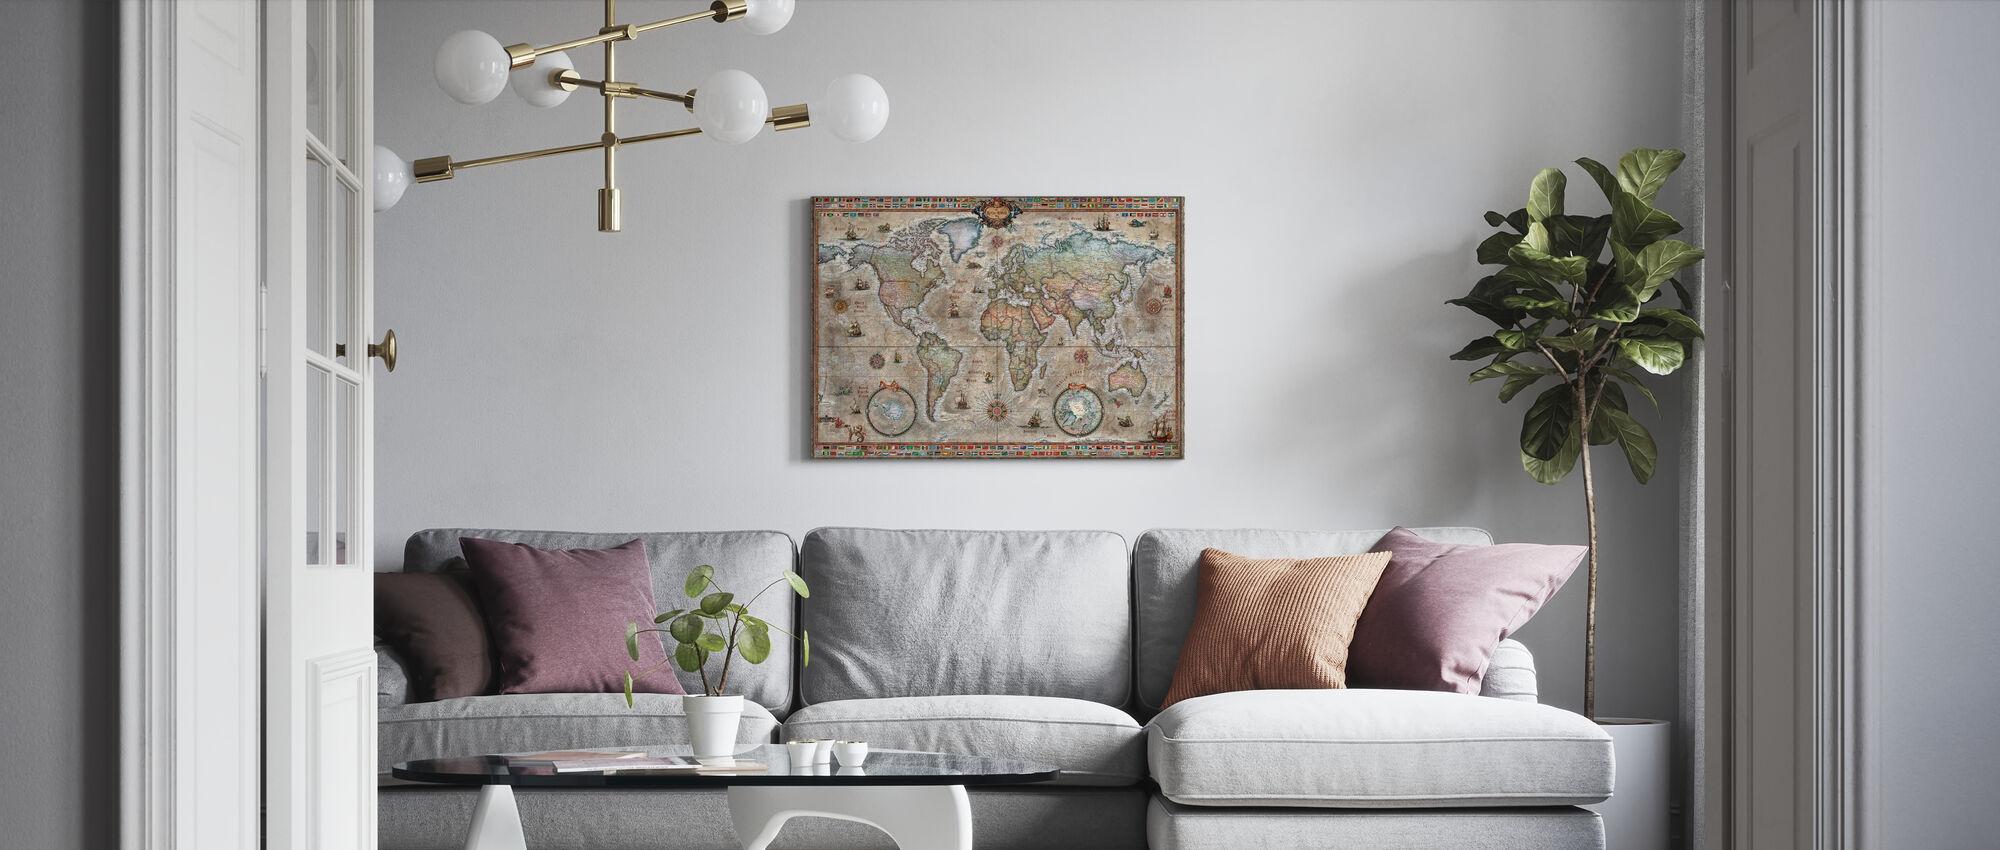 Retro World Map Nordic - Canvastaulu - Olohuone